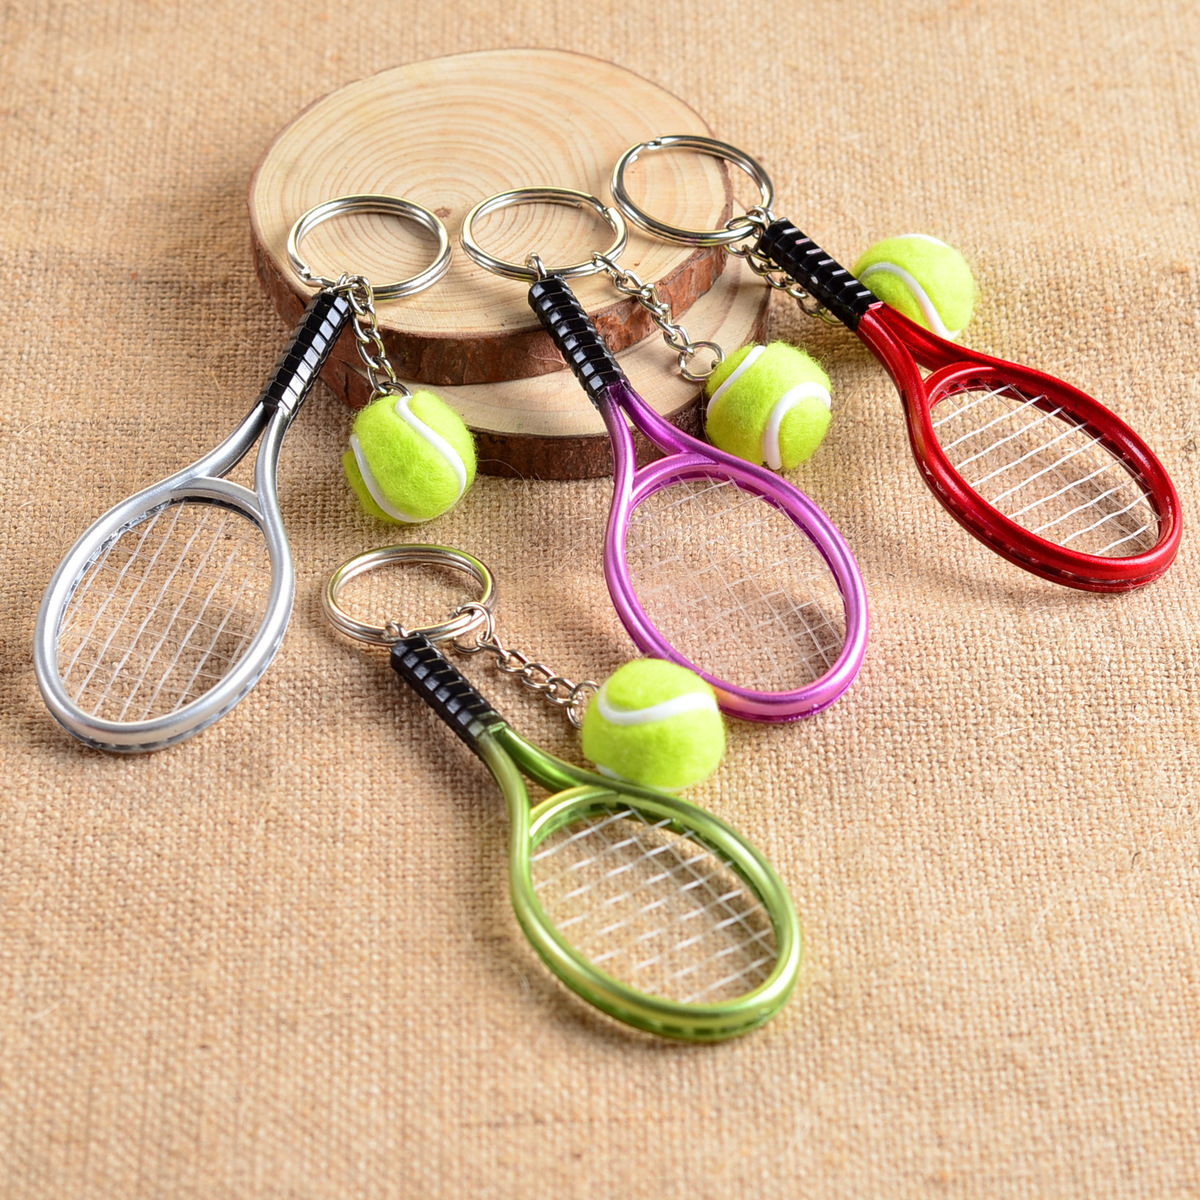 ZARSIA 10pcs Mini Tennis Tennis Racket Key Buckle tennis balls Advertisement Promotion Activity Propaganda Gift(China)